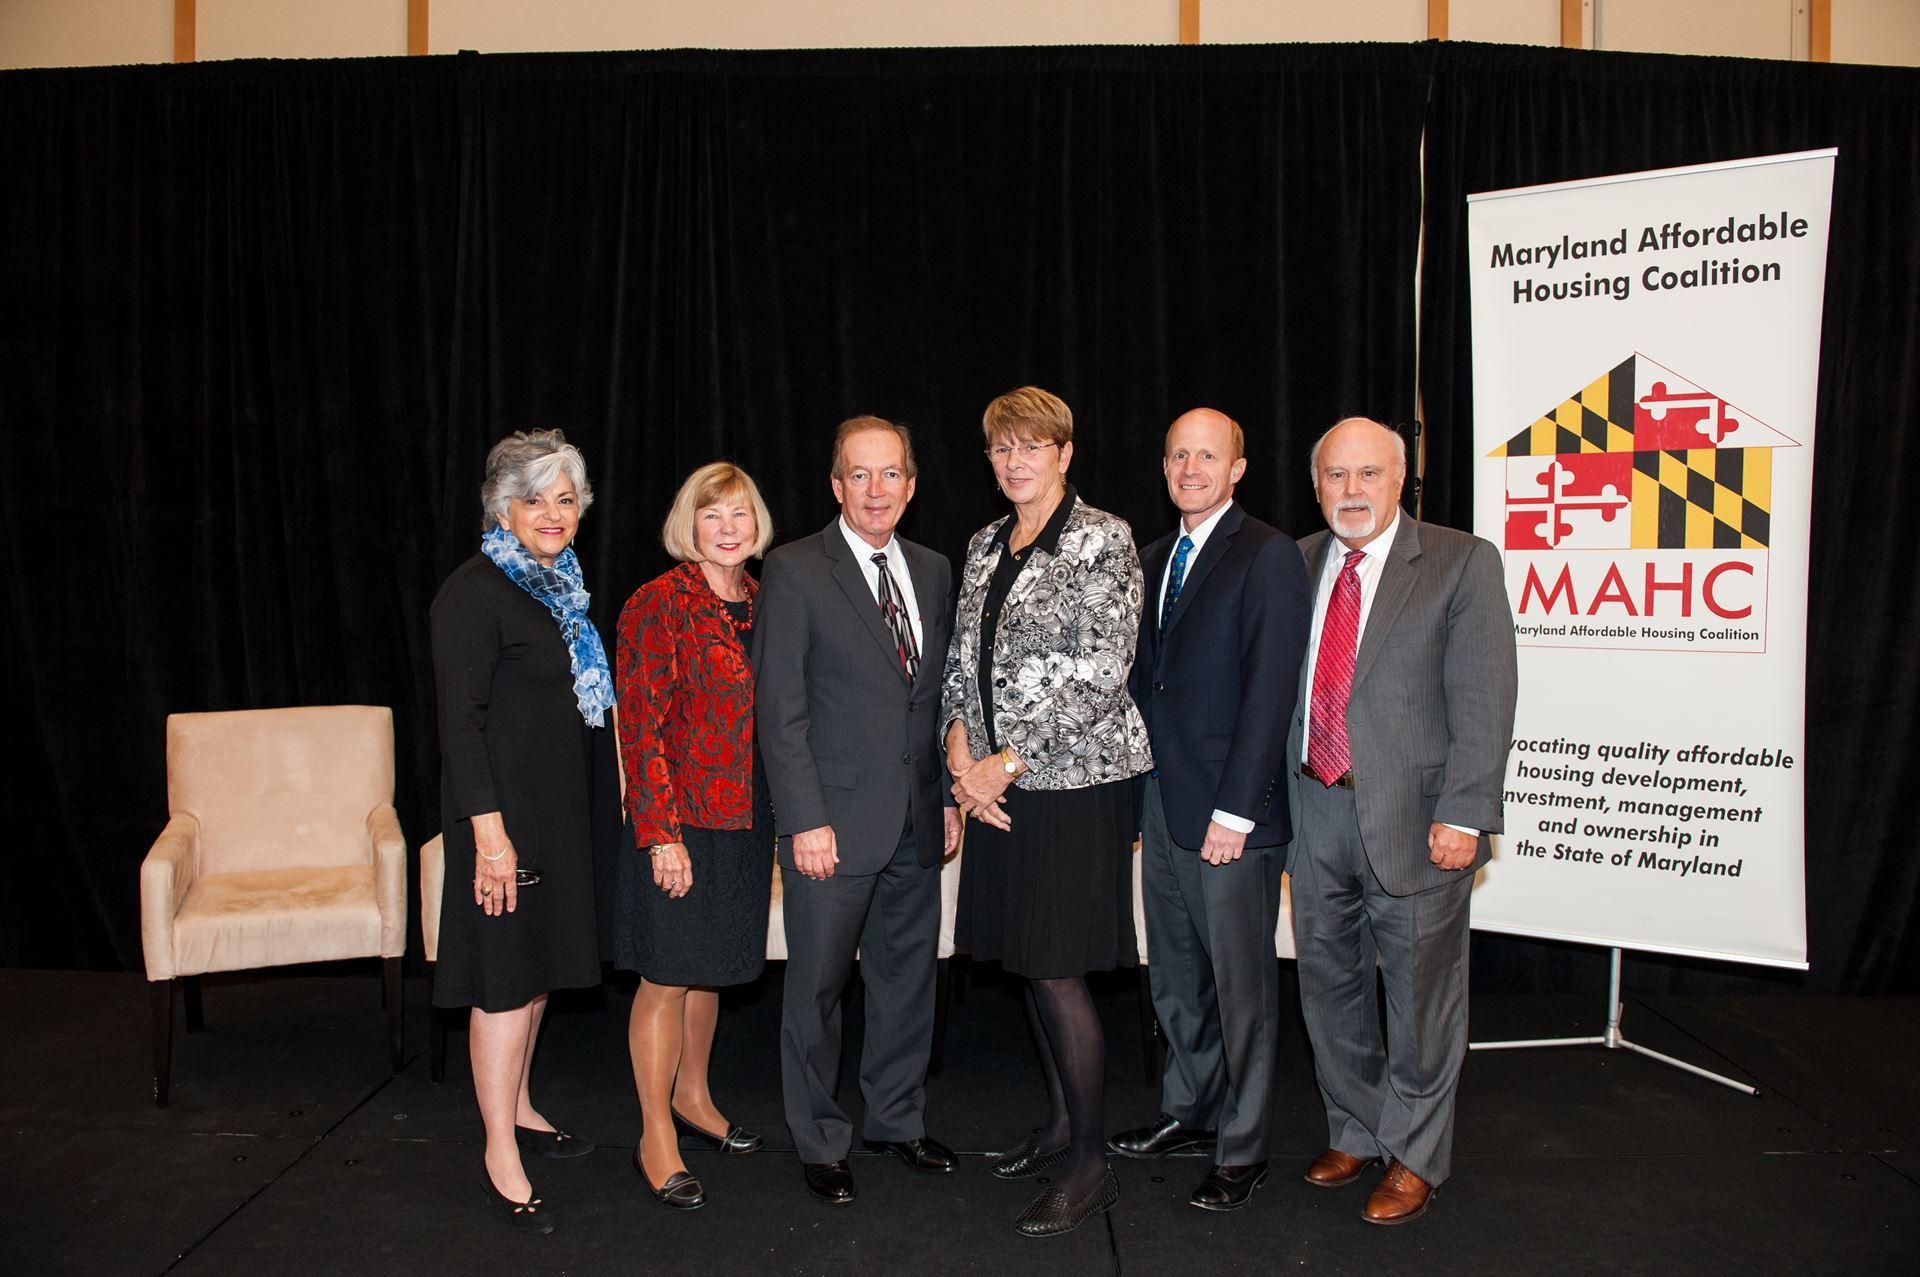 Maryland Affordable Housing Coalition - November 2015 Newsletter